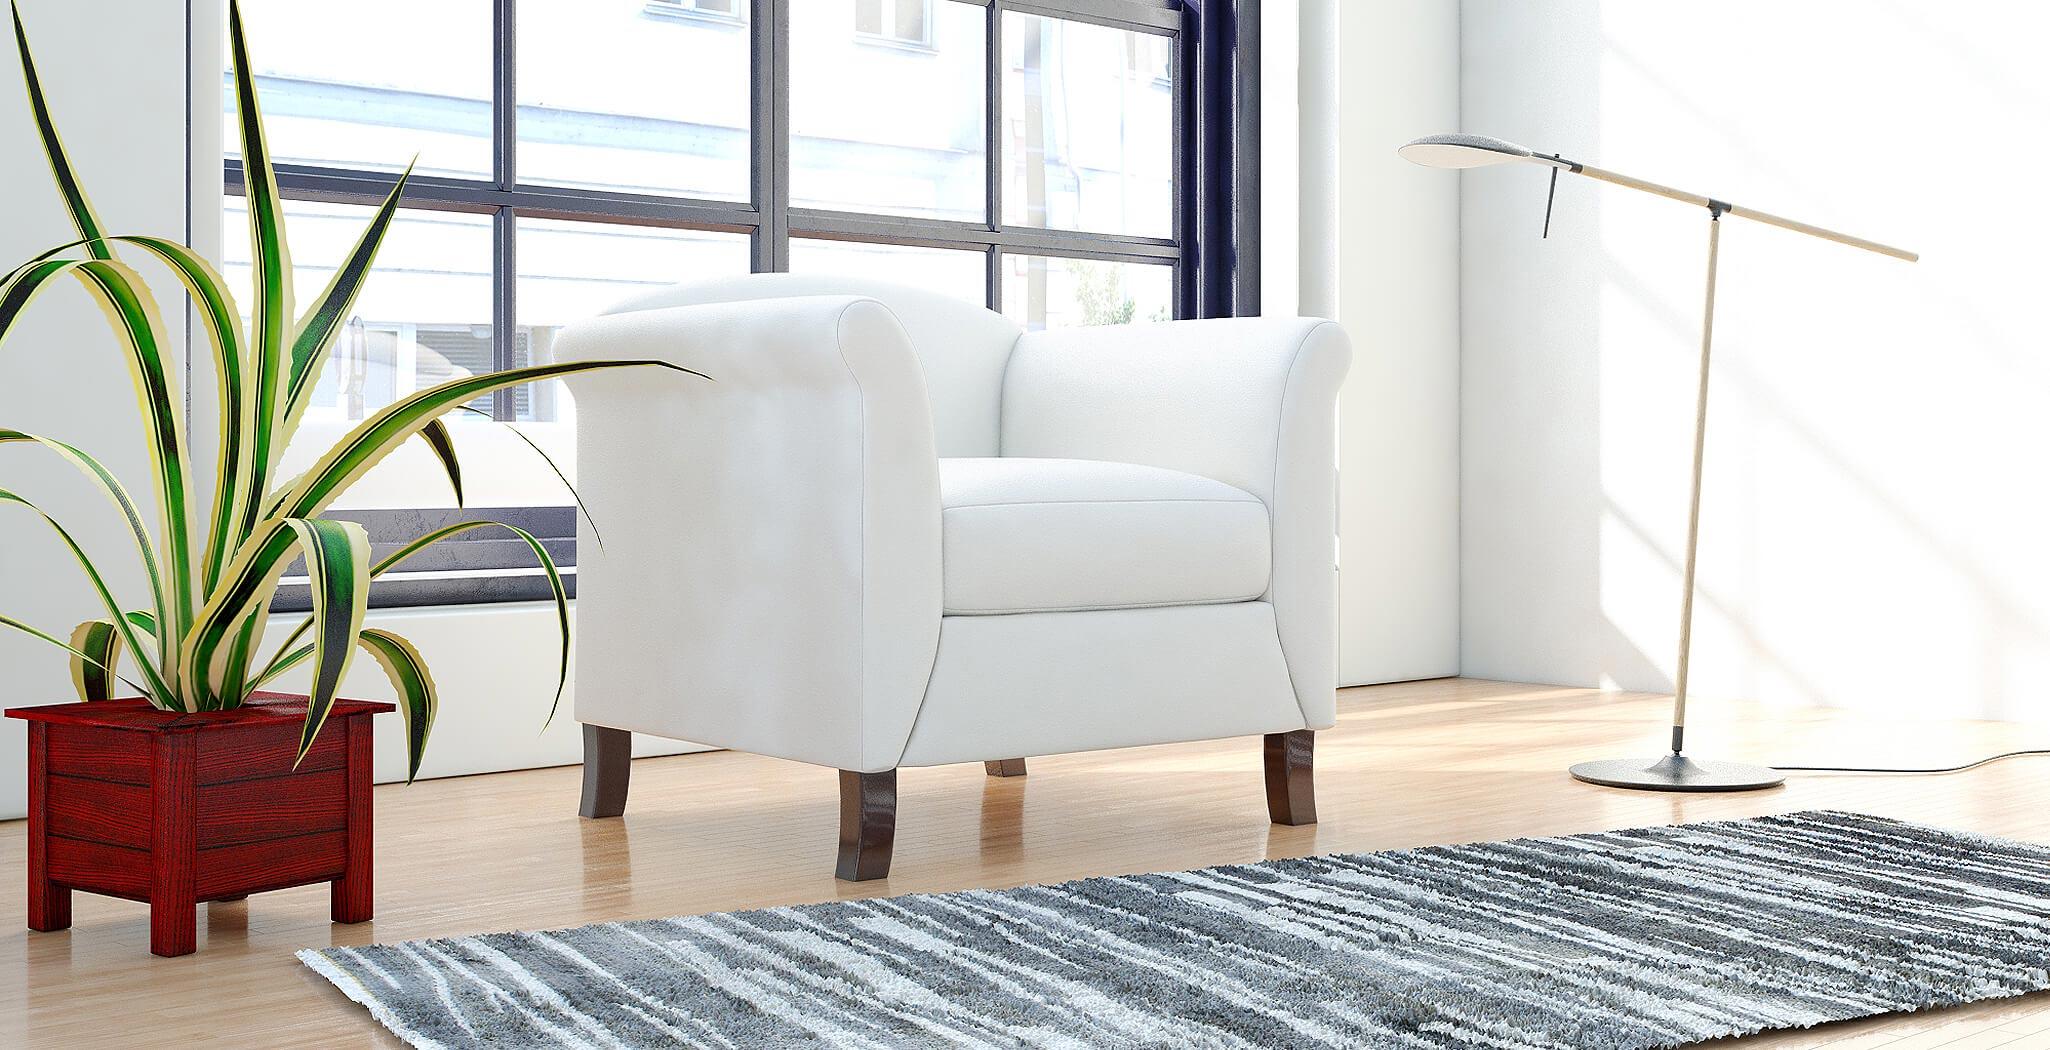 crete chair furniture gallery 2